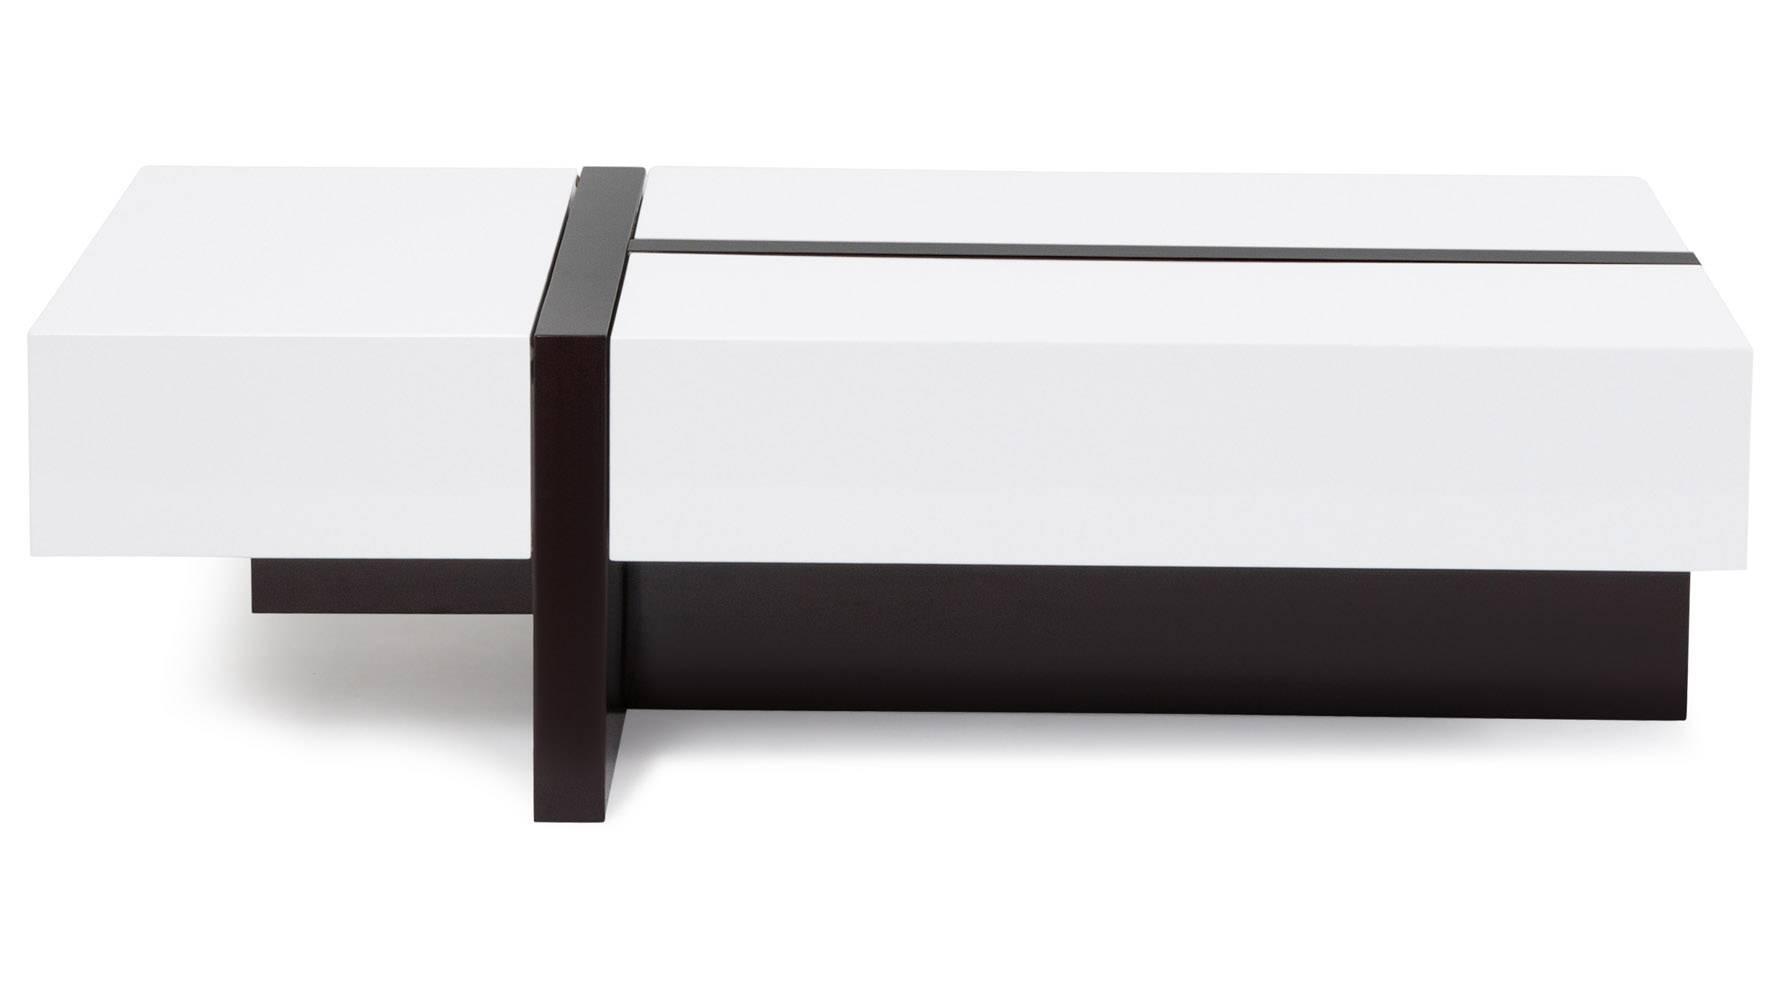 Mcintosh High Gloss Coffee Table With Storage - White Rectangle within High Gloss Coffee Tables (Image 17 of 30)